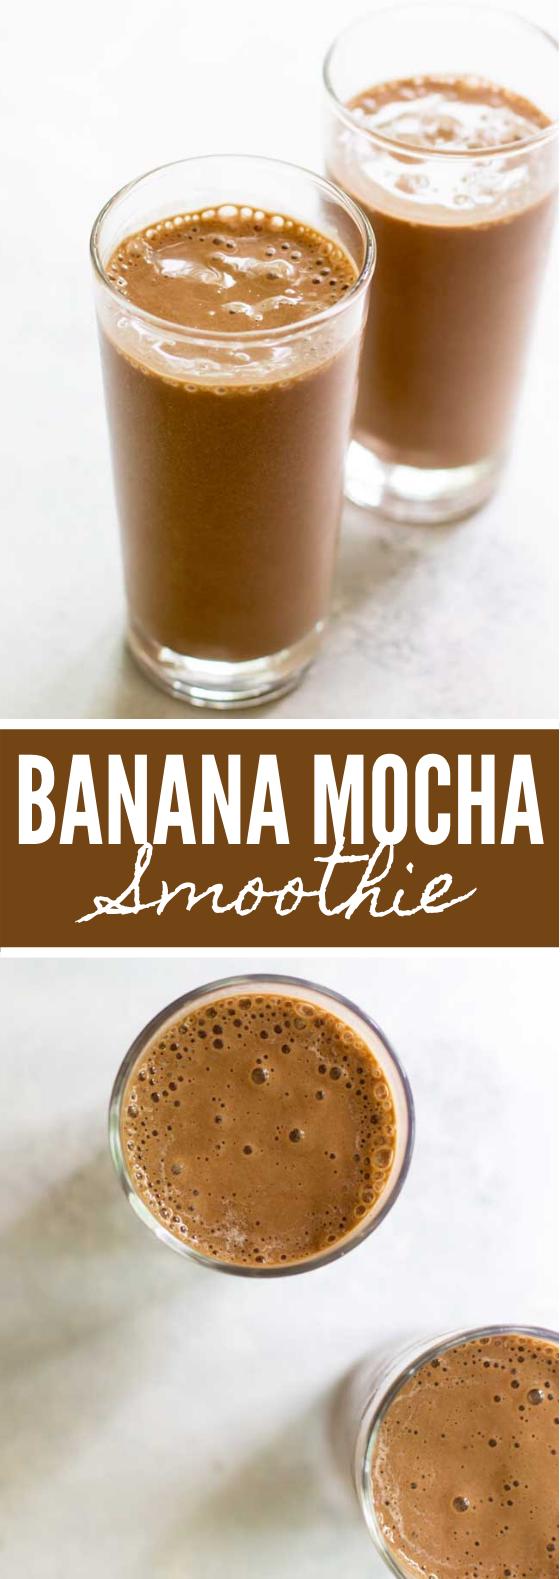 4-INGREDIENT BANANA MOCHA SMOOTHIE #drinks #sweets